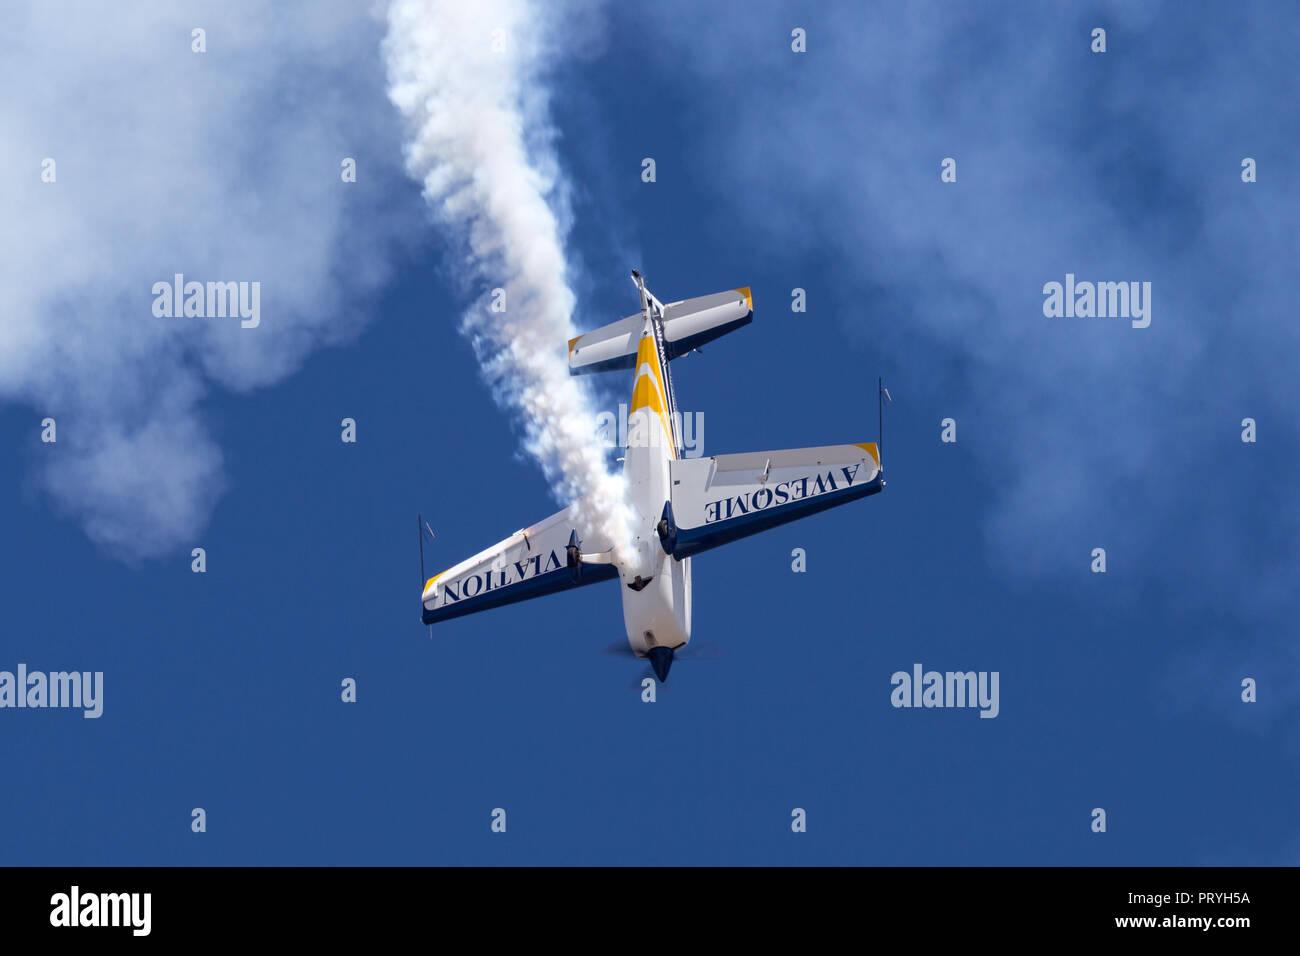 British aerobatic pilot Mark Jefferies flying a single engine Extra 330LX aerobatic aircraft VH-IXN. - Stock Image